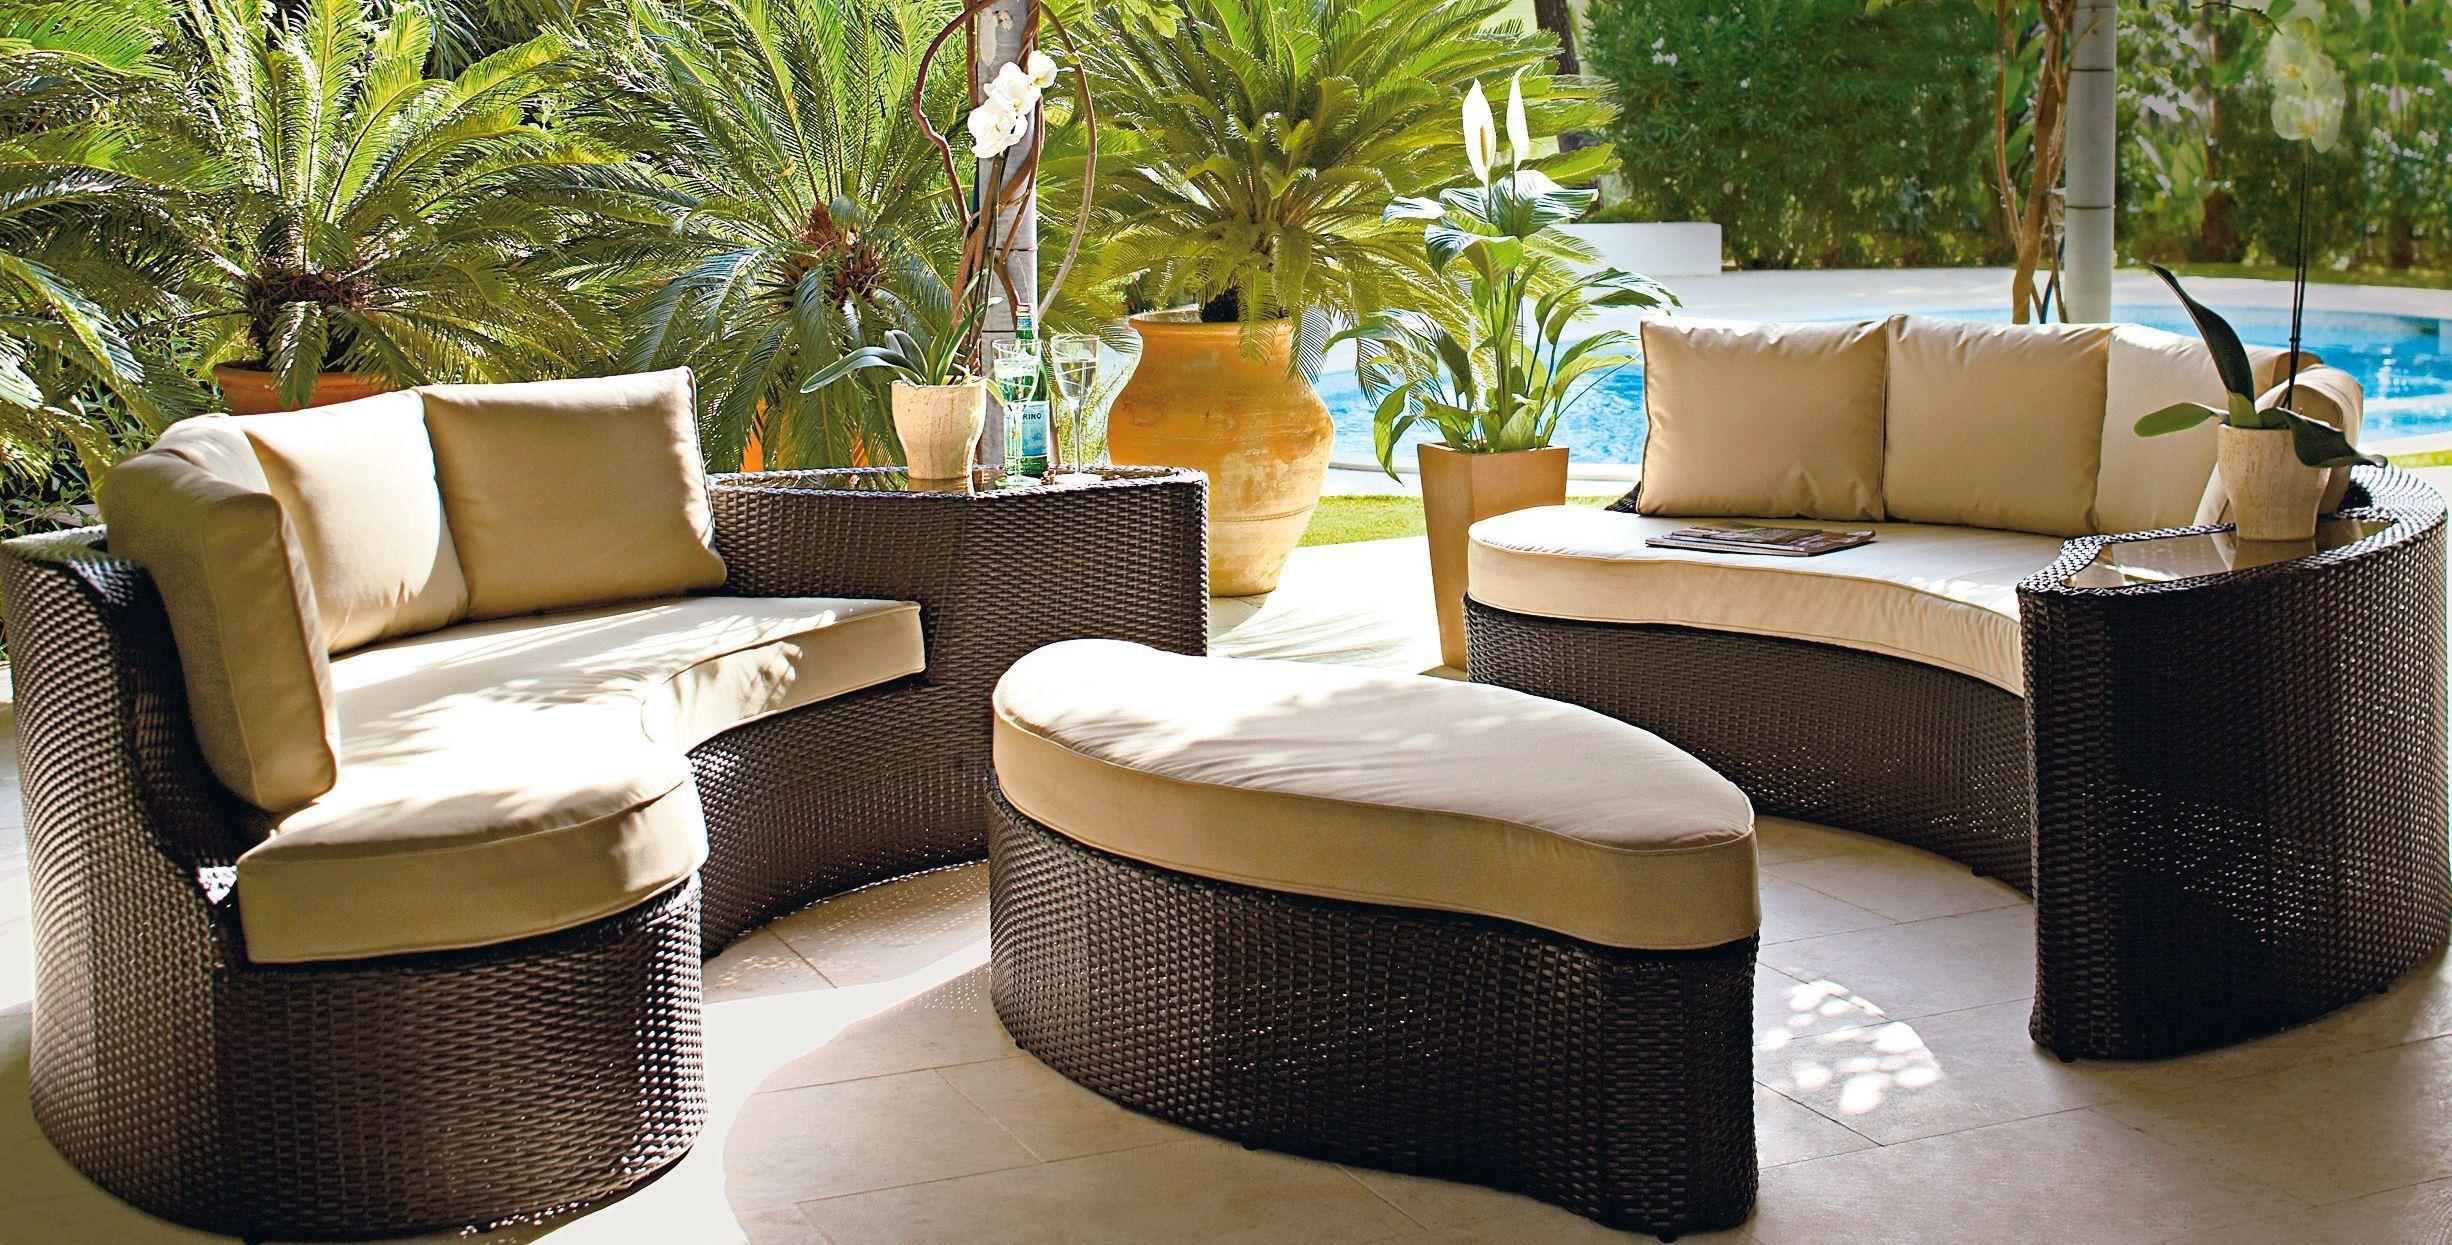 rattan effect garden furniture collection rattan effect 6 seater patio sofa set 2 sofas652/3835 MSTSLXQ